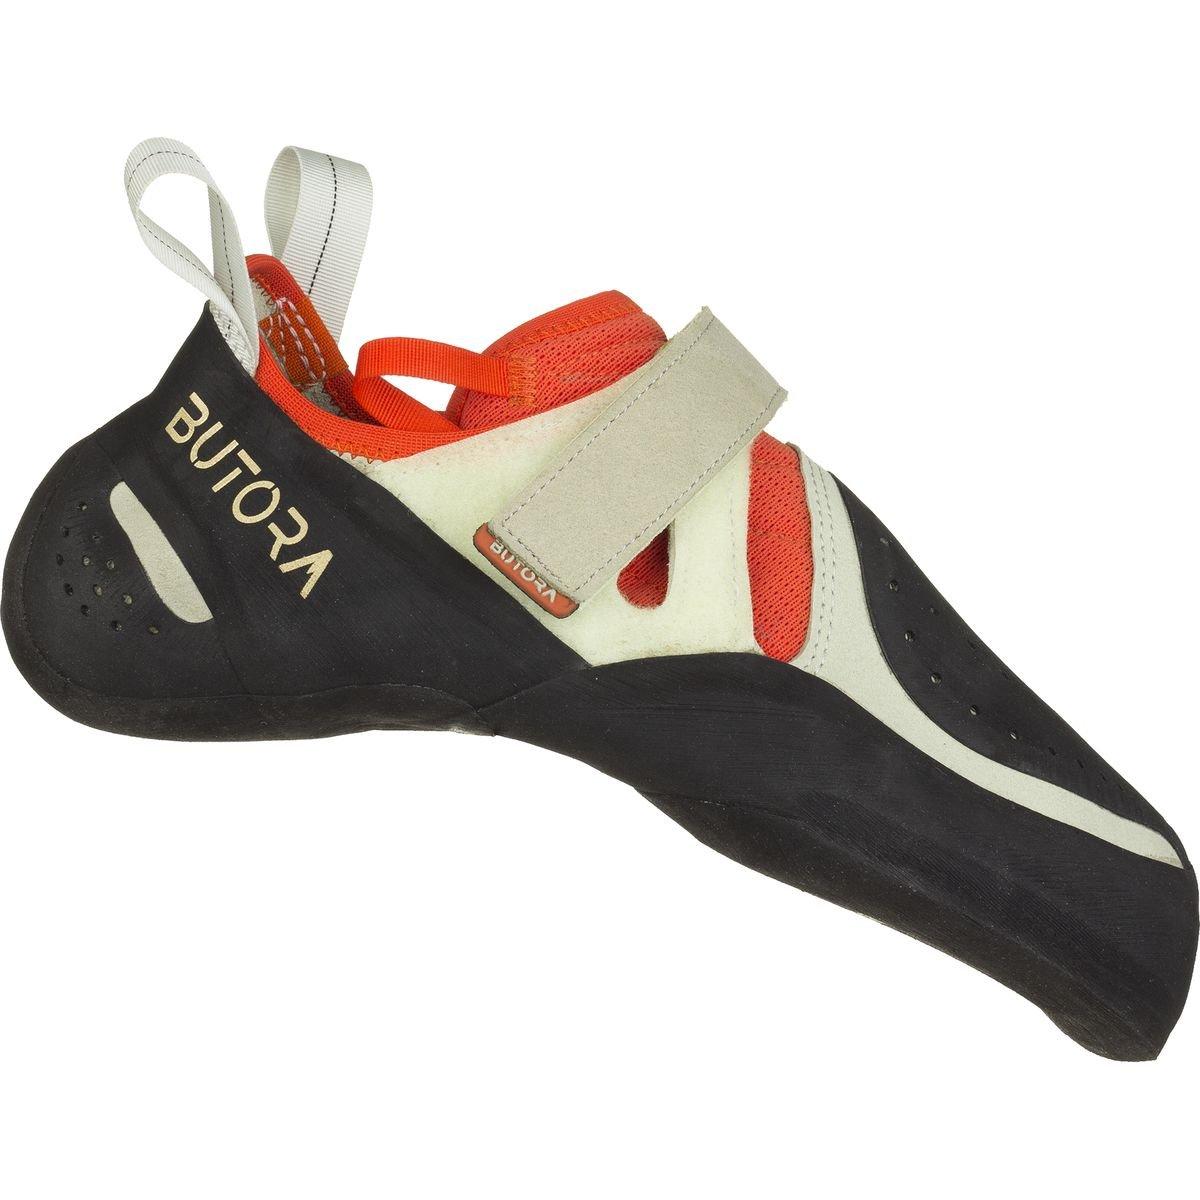 Butora Acro Wide Fit Climbing Shoe - Men's Orange/White 11